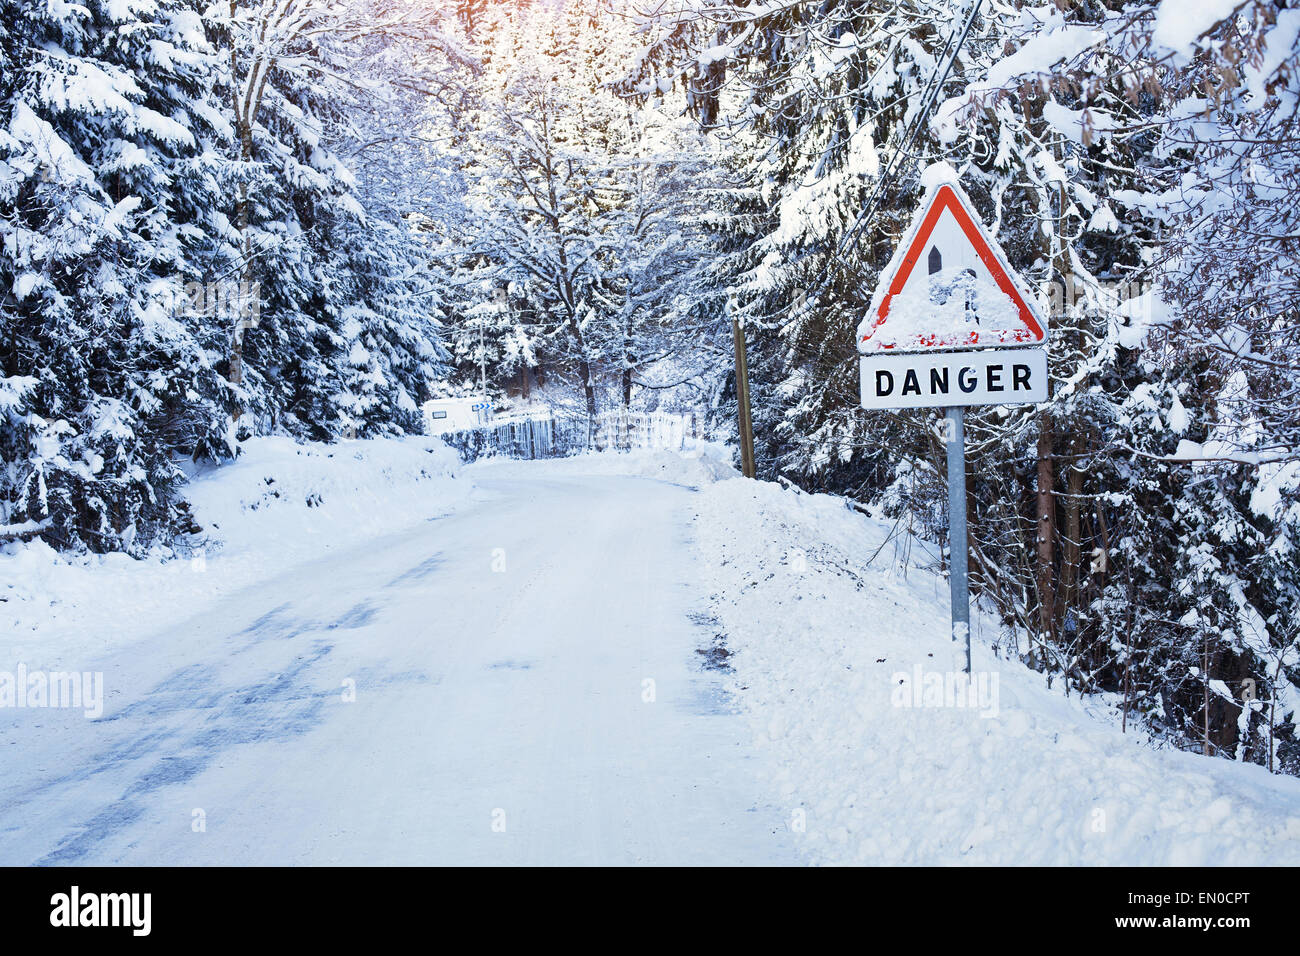 danger sign on the frozen road - Stock Image